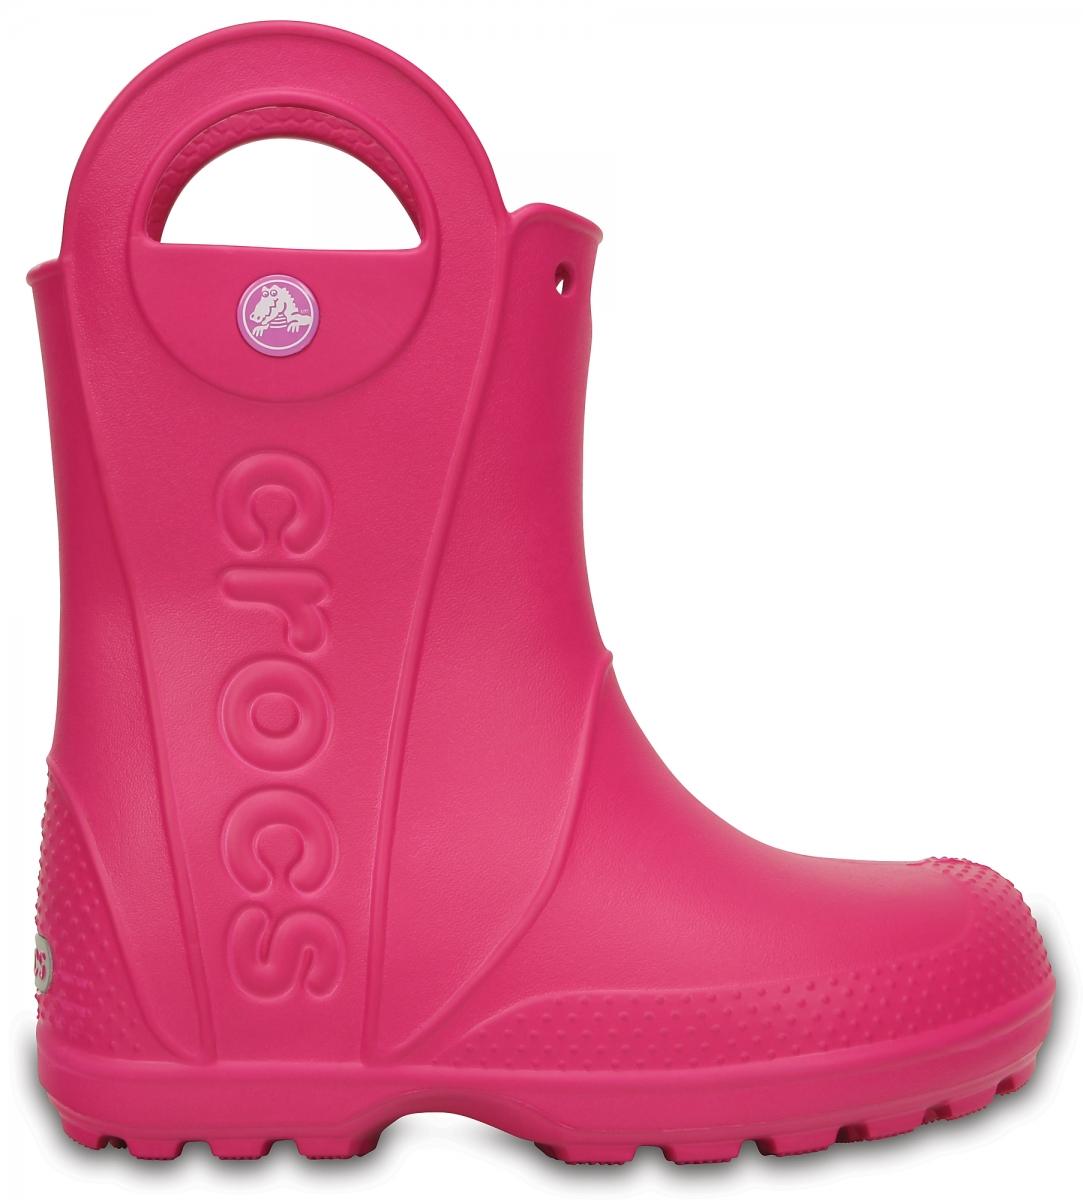 Crocs Handle It Rain Boot Kids - Candy Pink, C13 (30-31)